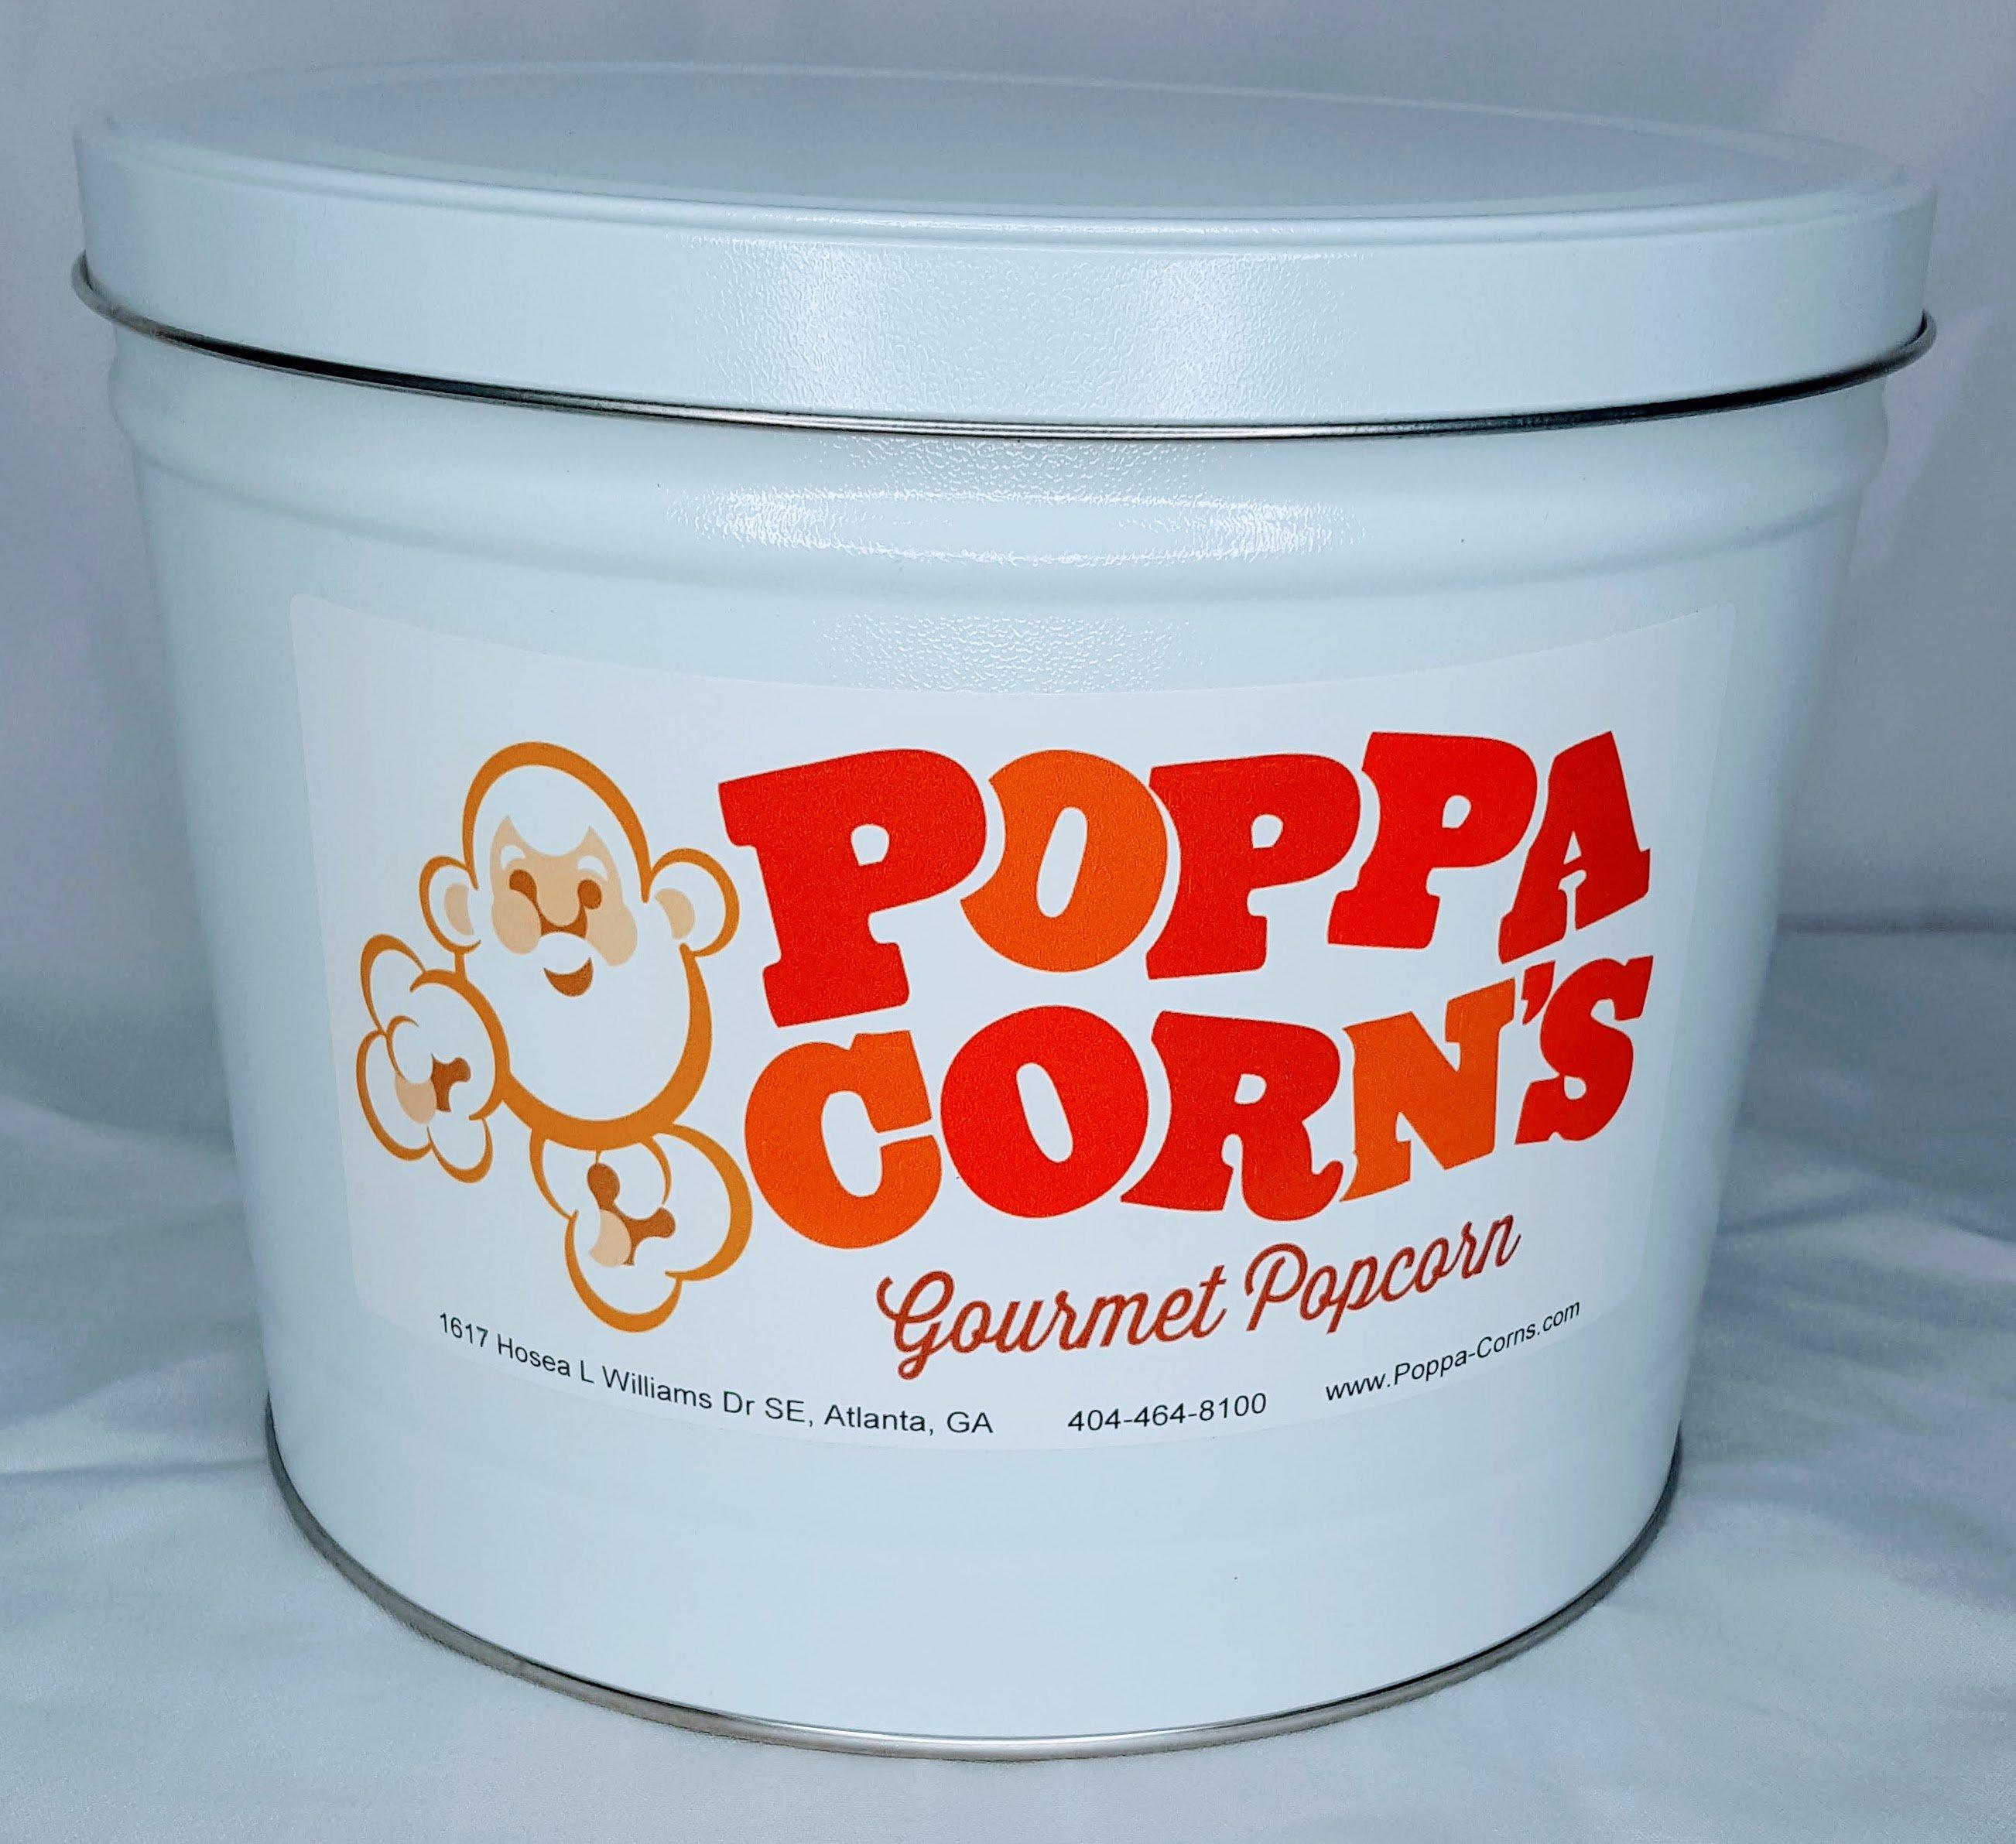 Poppa Corns